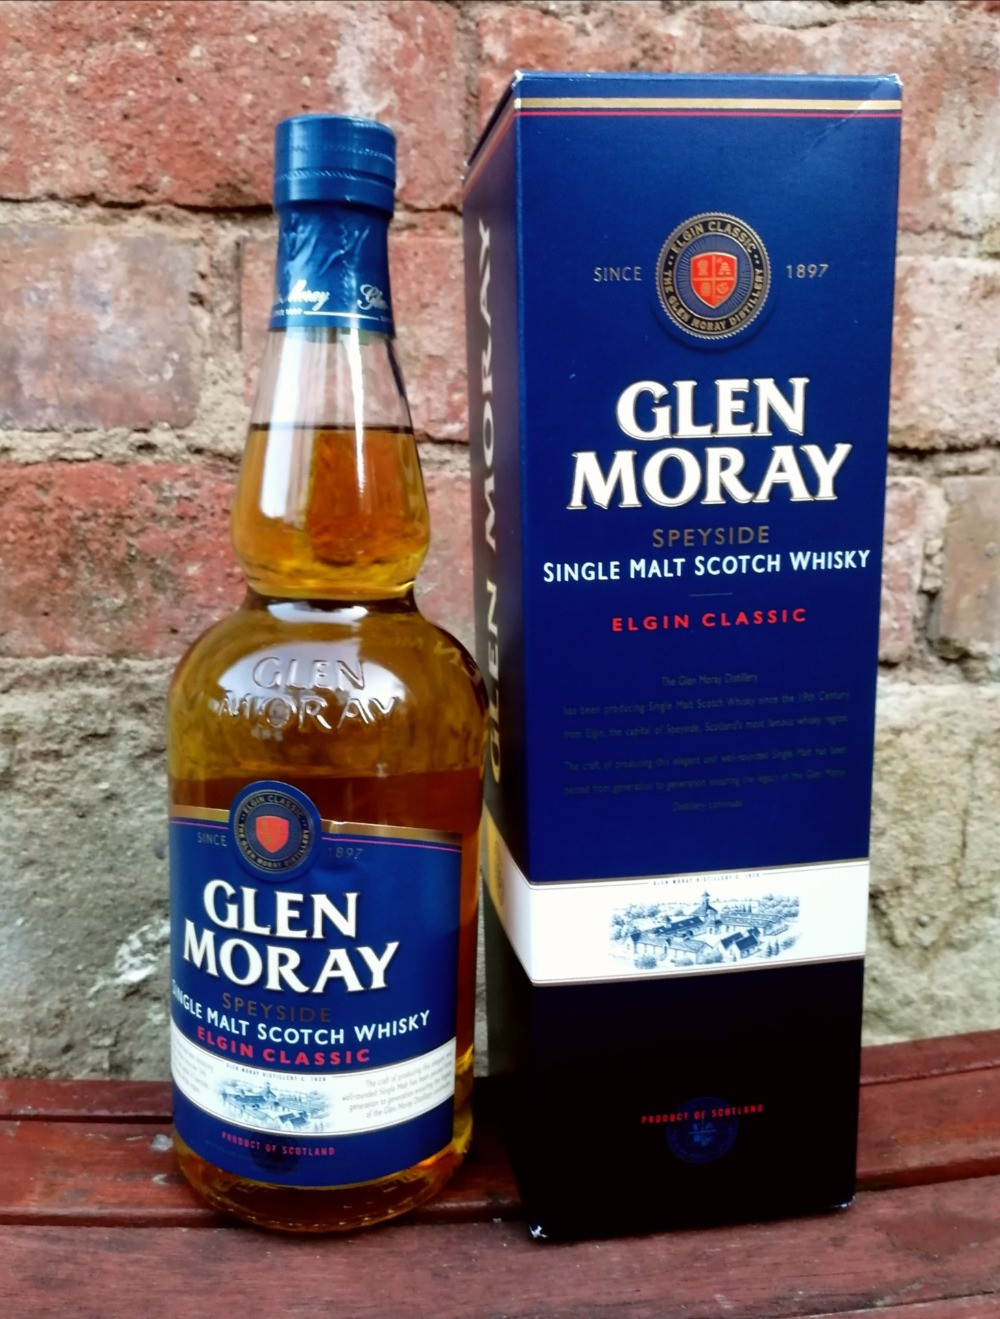 Glen Moray Classic single malt